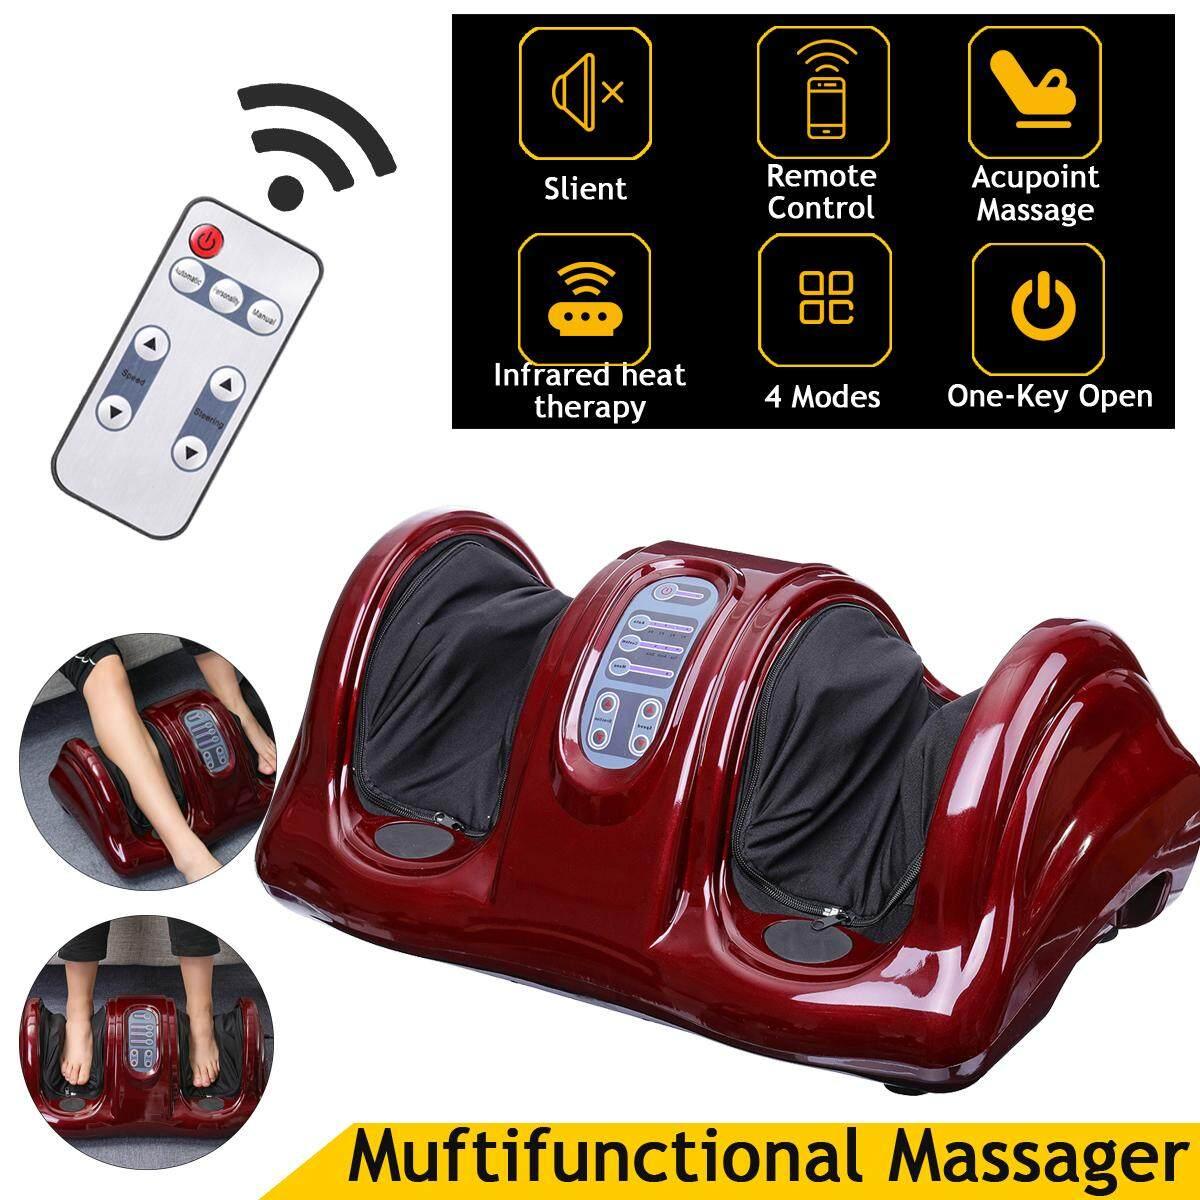 Electric Heating Foot Massager Shiatsu Kneading Machine Calf Leg Pain Relief Color:black By Moonbeam.